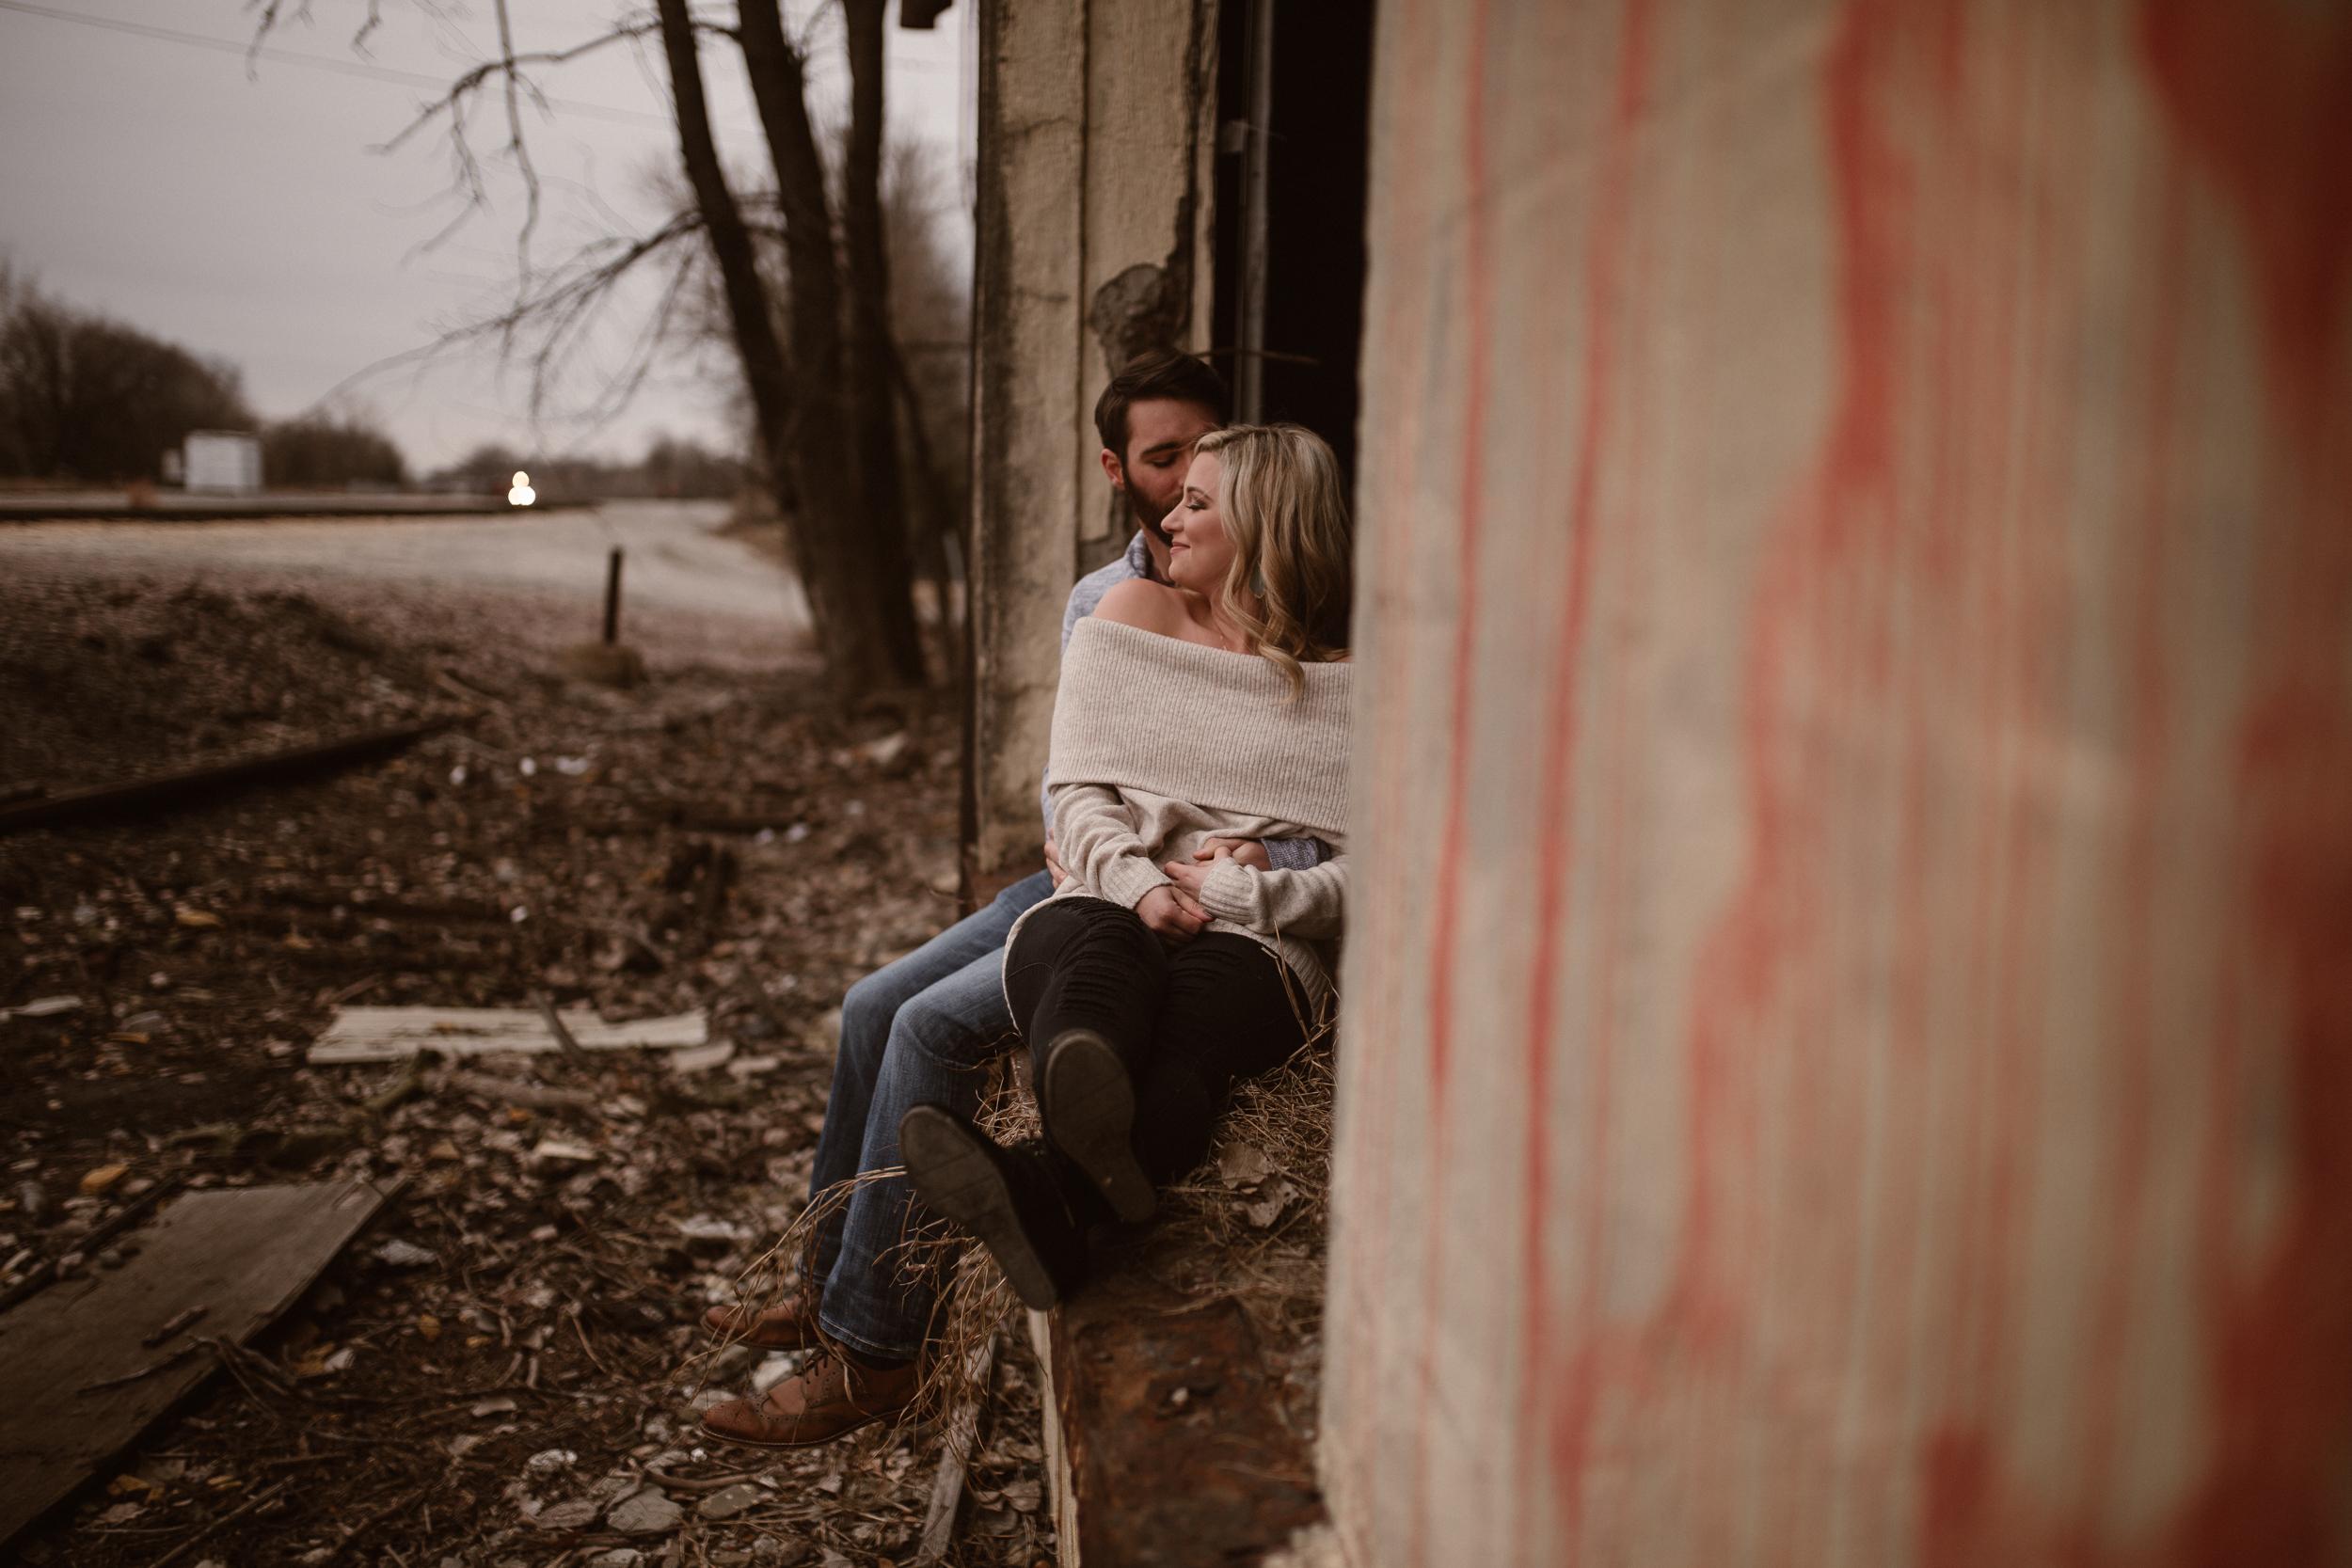 The Hatches   Memphis, Tennessee Wedding Photographers   Destination and Elopement Photographers   memphis-nashville-tennessee-utah-colorado-arkansas-washington-norway-arizona-wedding-photographer-elopement-unique-moody-modern-minimalist-journalistic-emotional-real-engagement-elopement-newlyweds